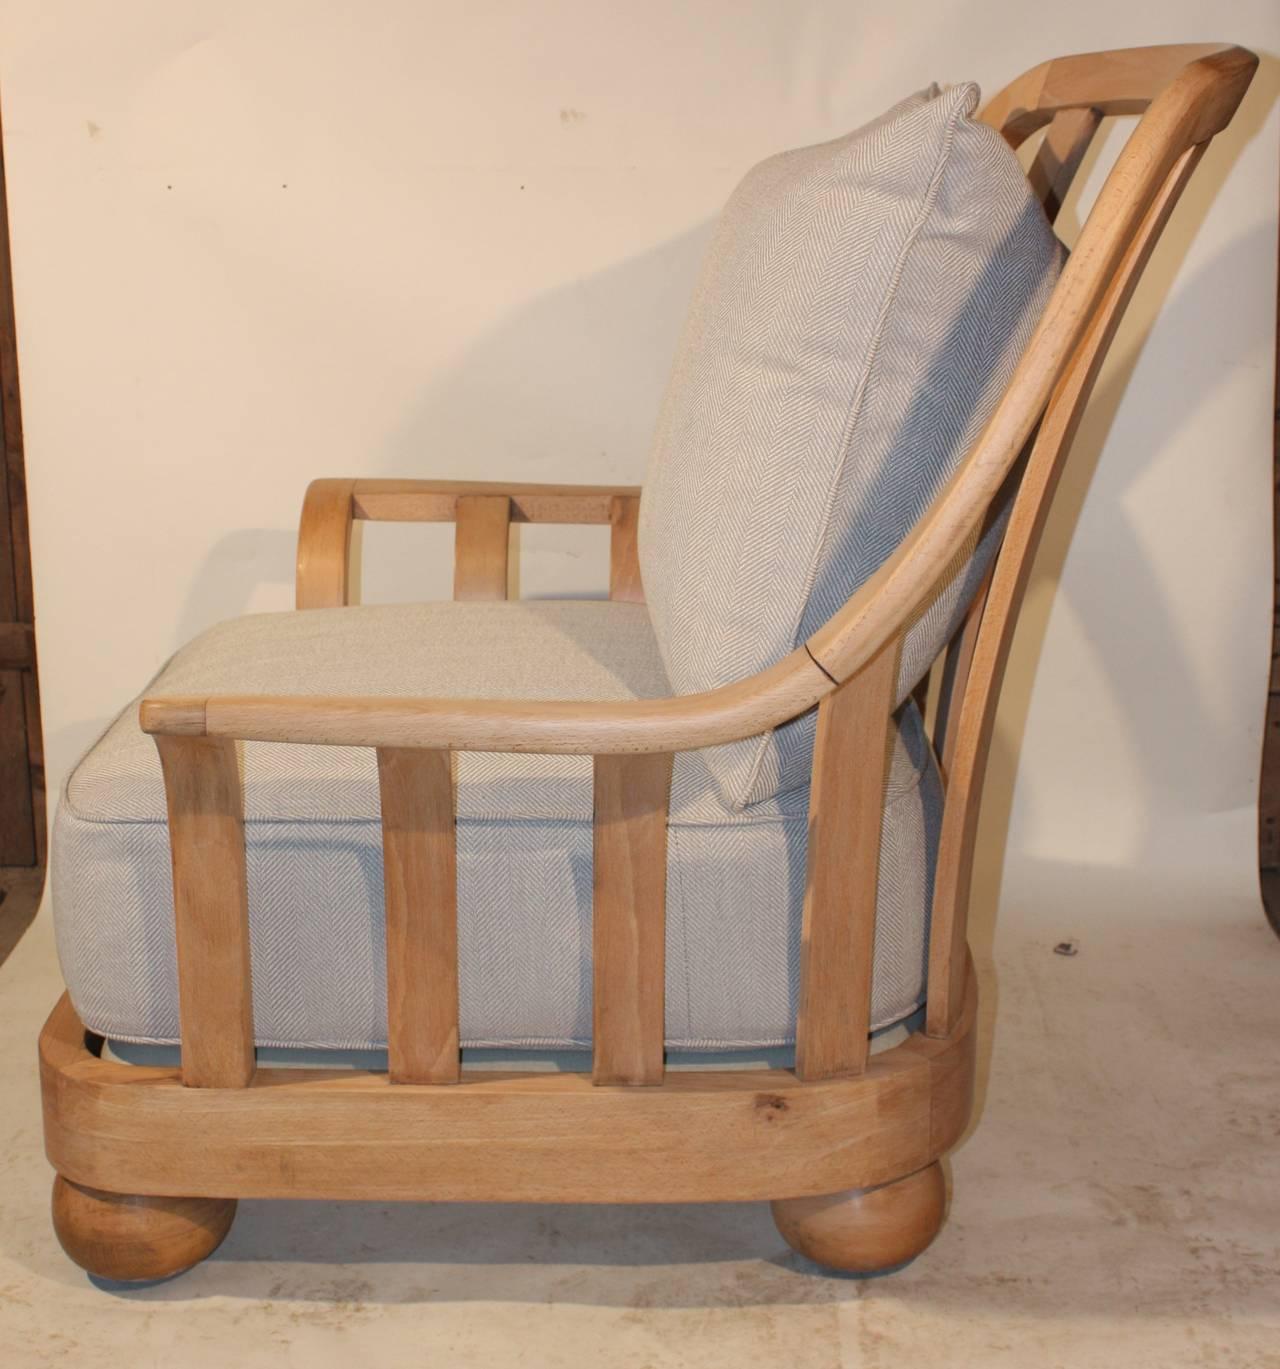 Overstuffed italian lounge chair circa 1930 at 1stdibs for Overstuffed armchair